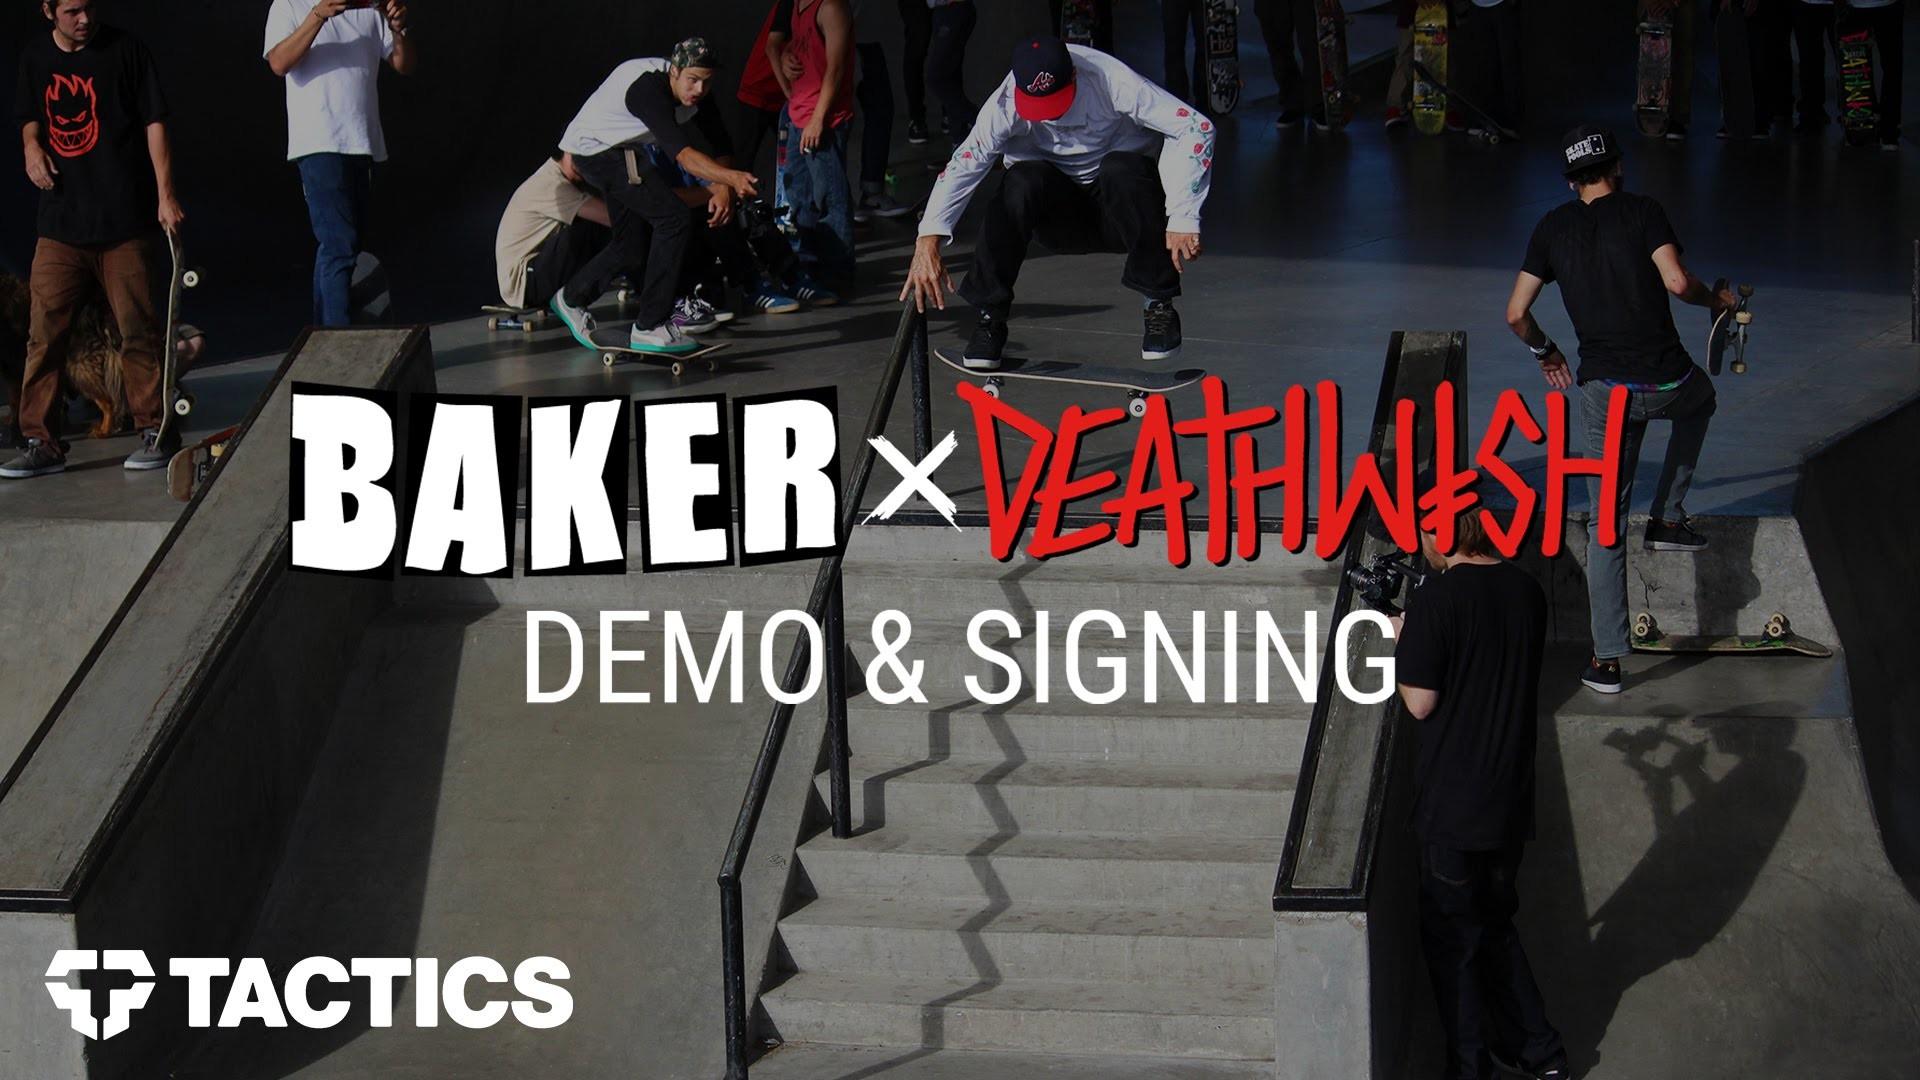 Res: 1920x1080, Baker x Deathwish Skateboards Demo & Signing at WJ Skatepark - Tactics.com  - YouTube